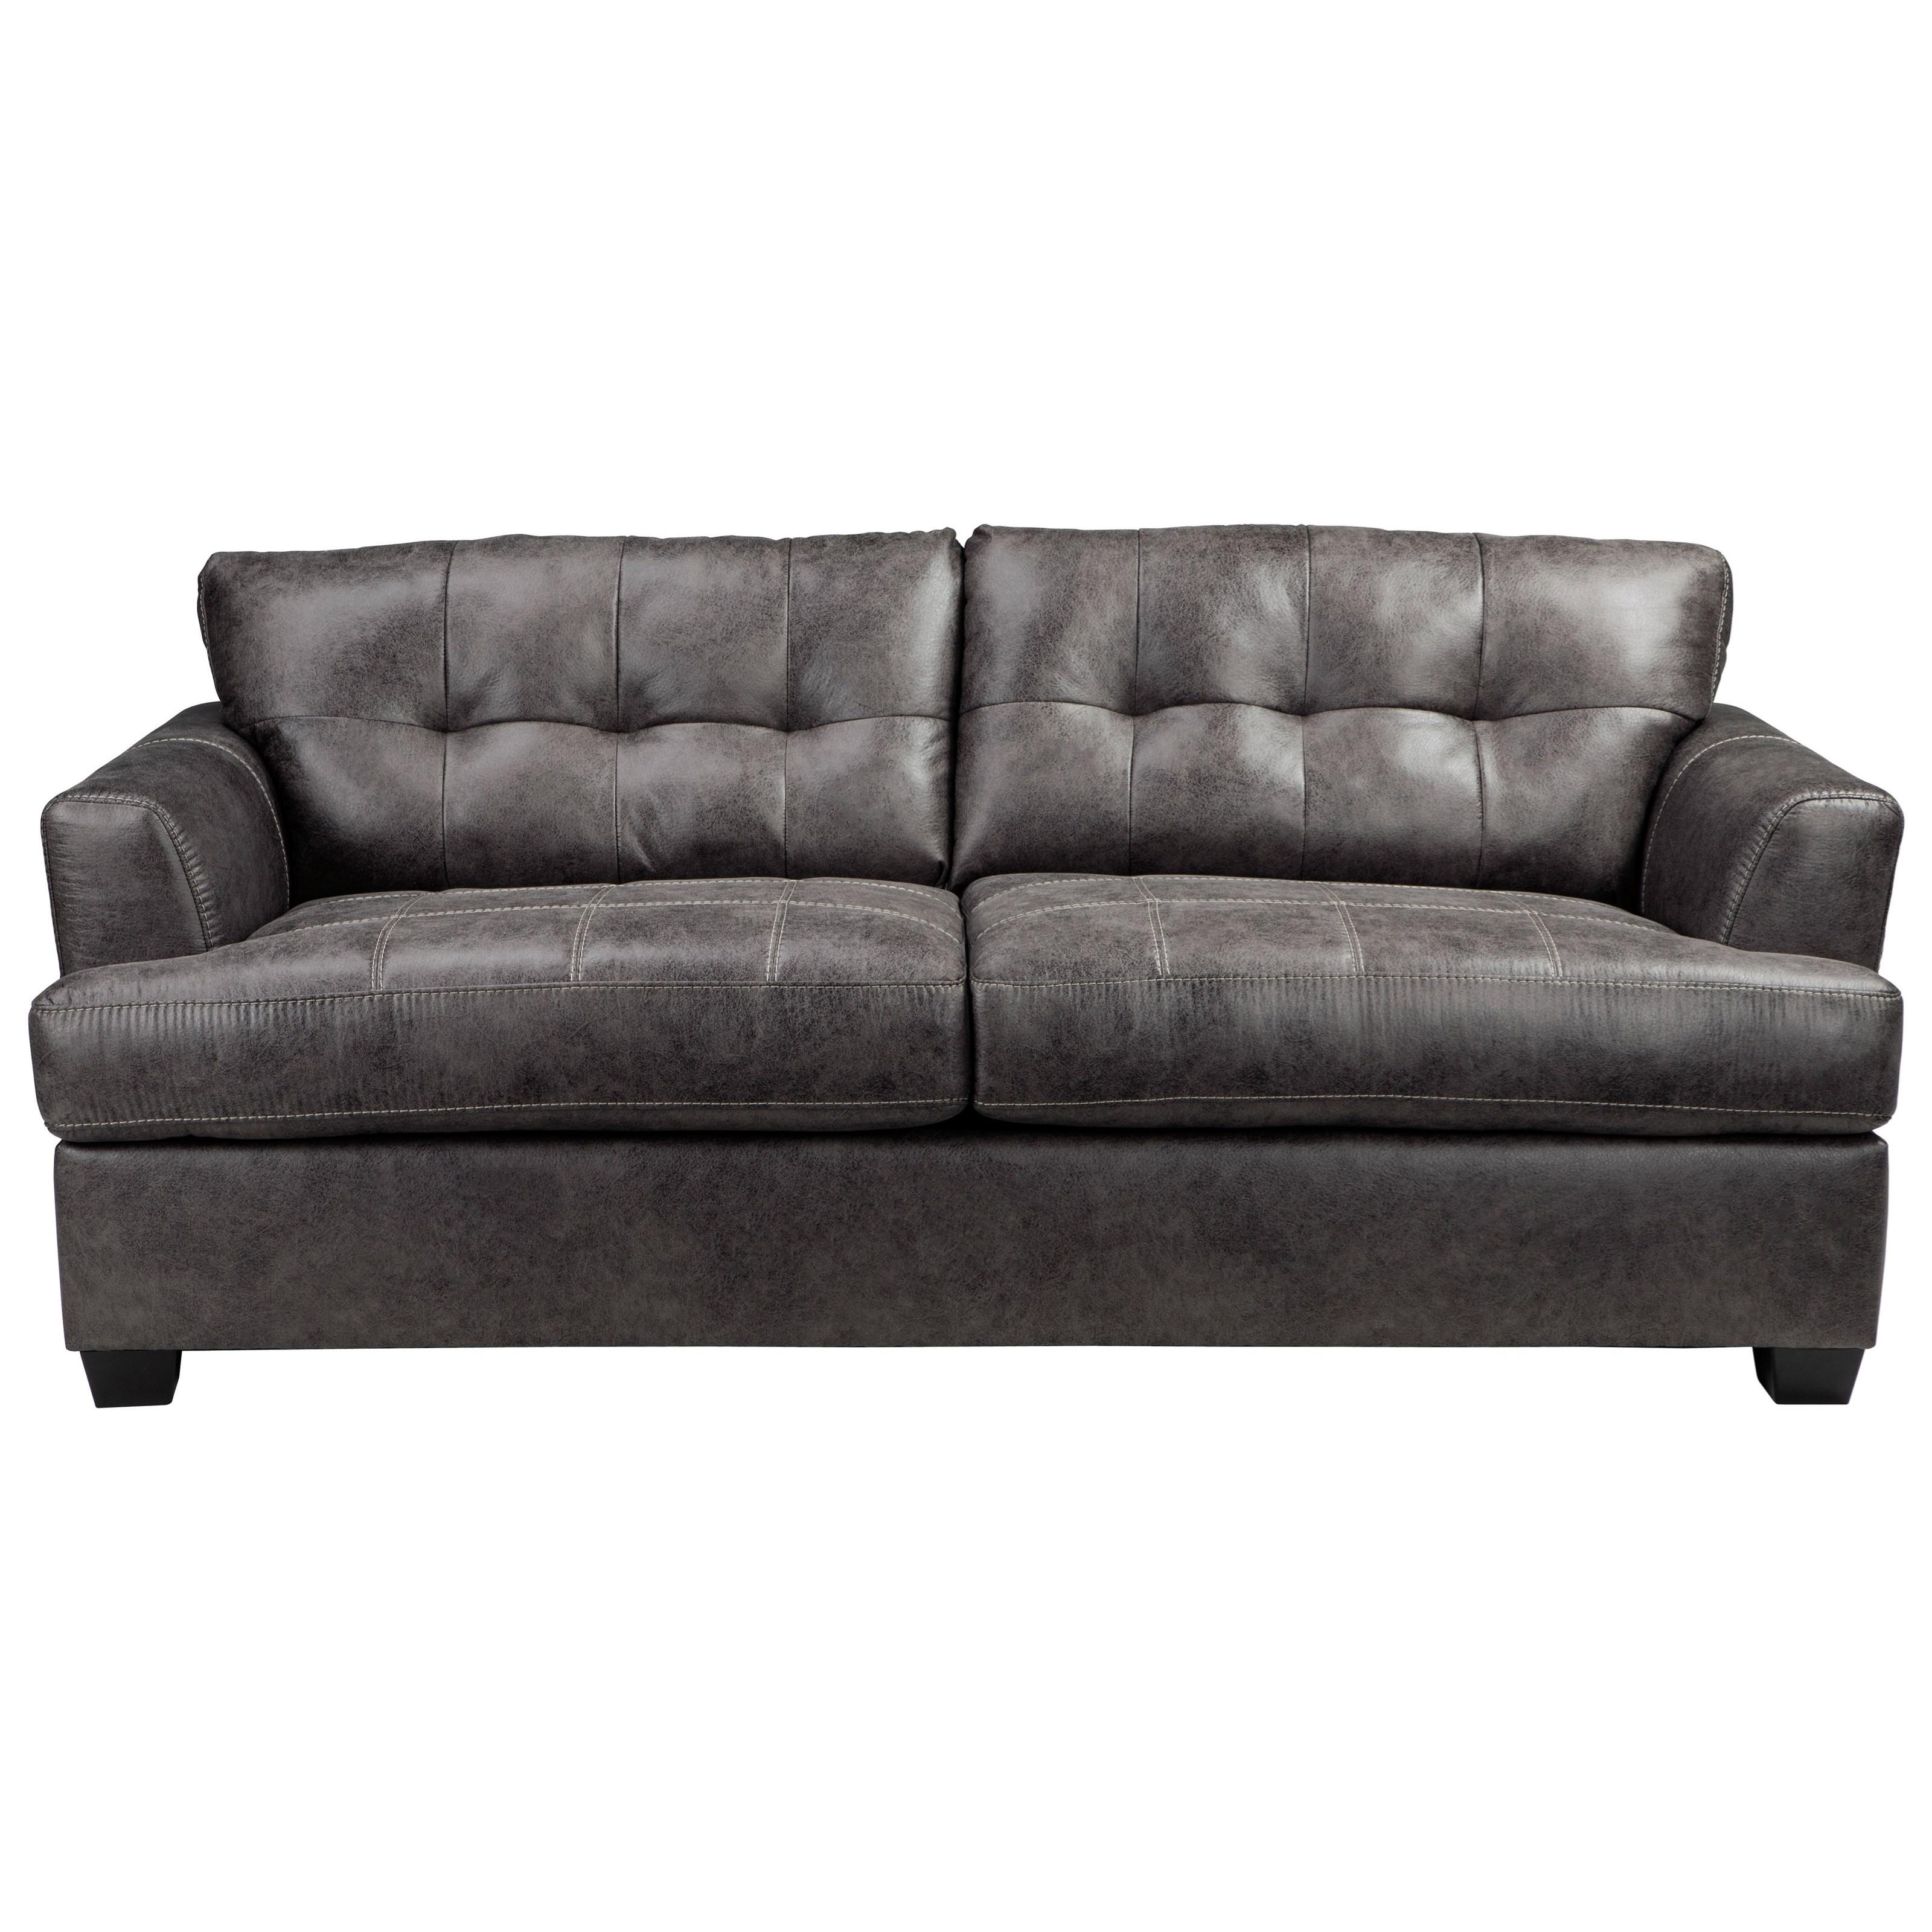 Benchcraft Leather Sofa Furniture Brown Benchcraft Sofa